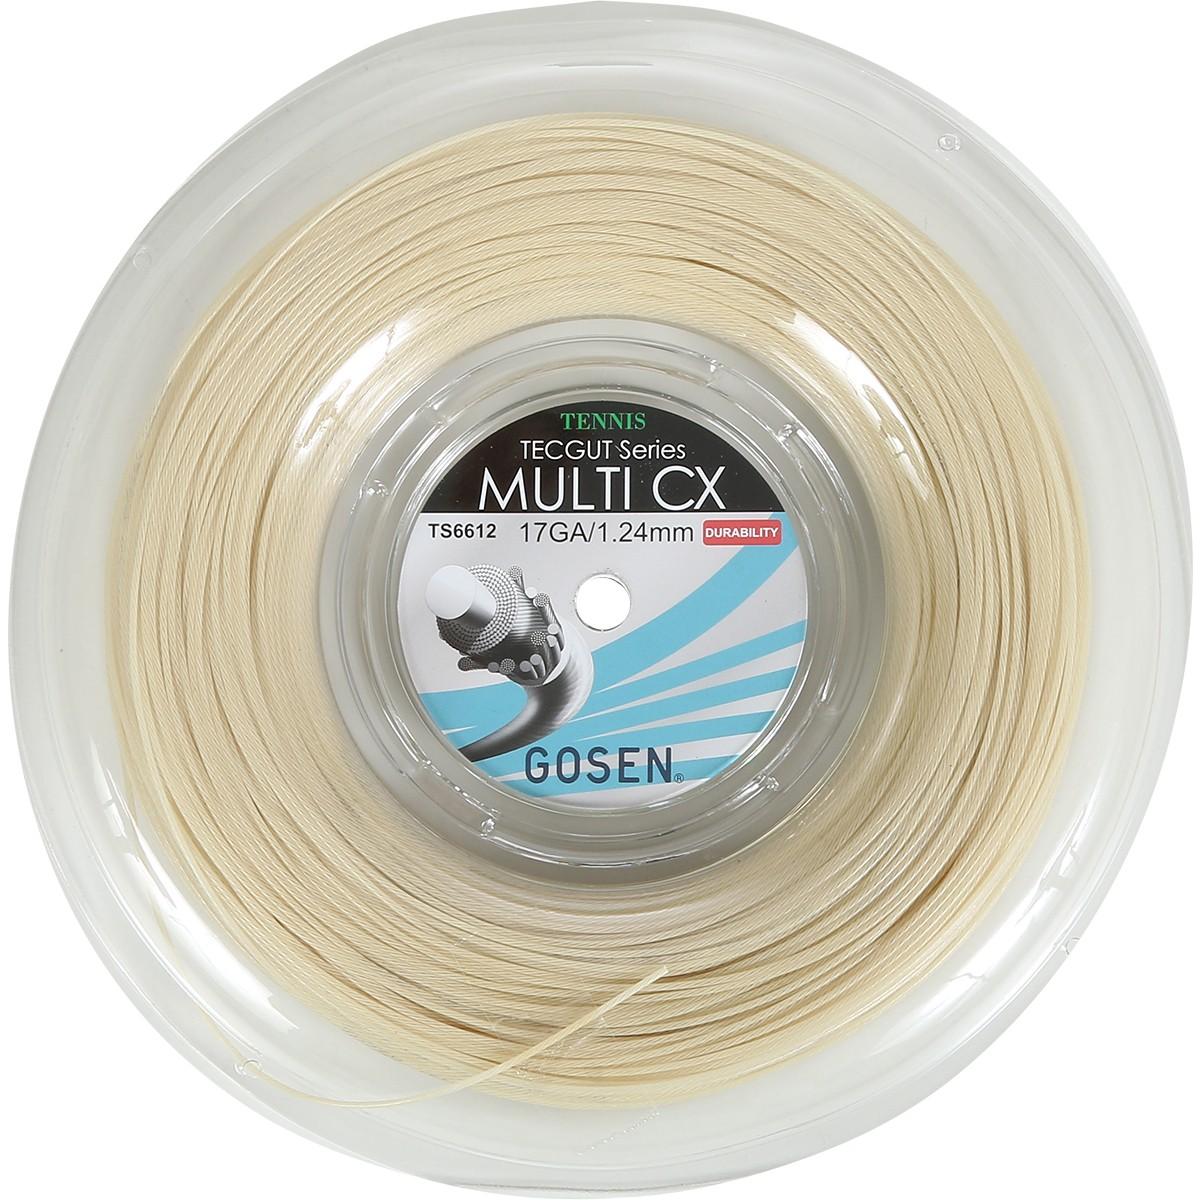 BOBINE GOSEN TECGUT MULTI CX (240 METRES)